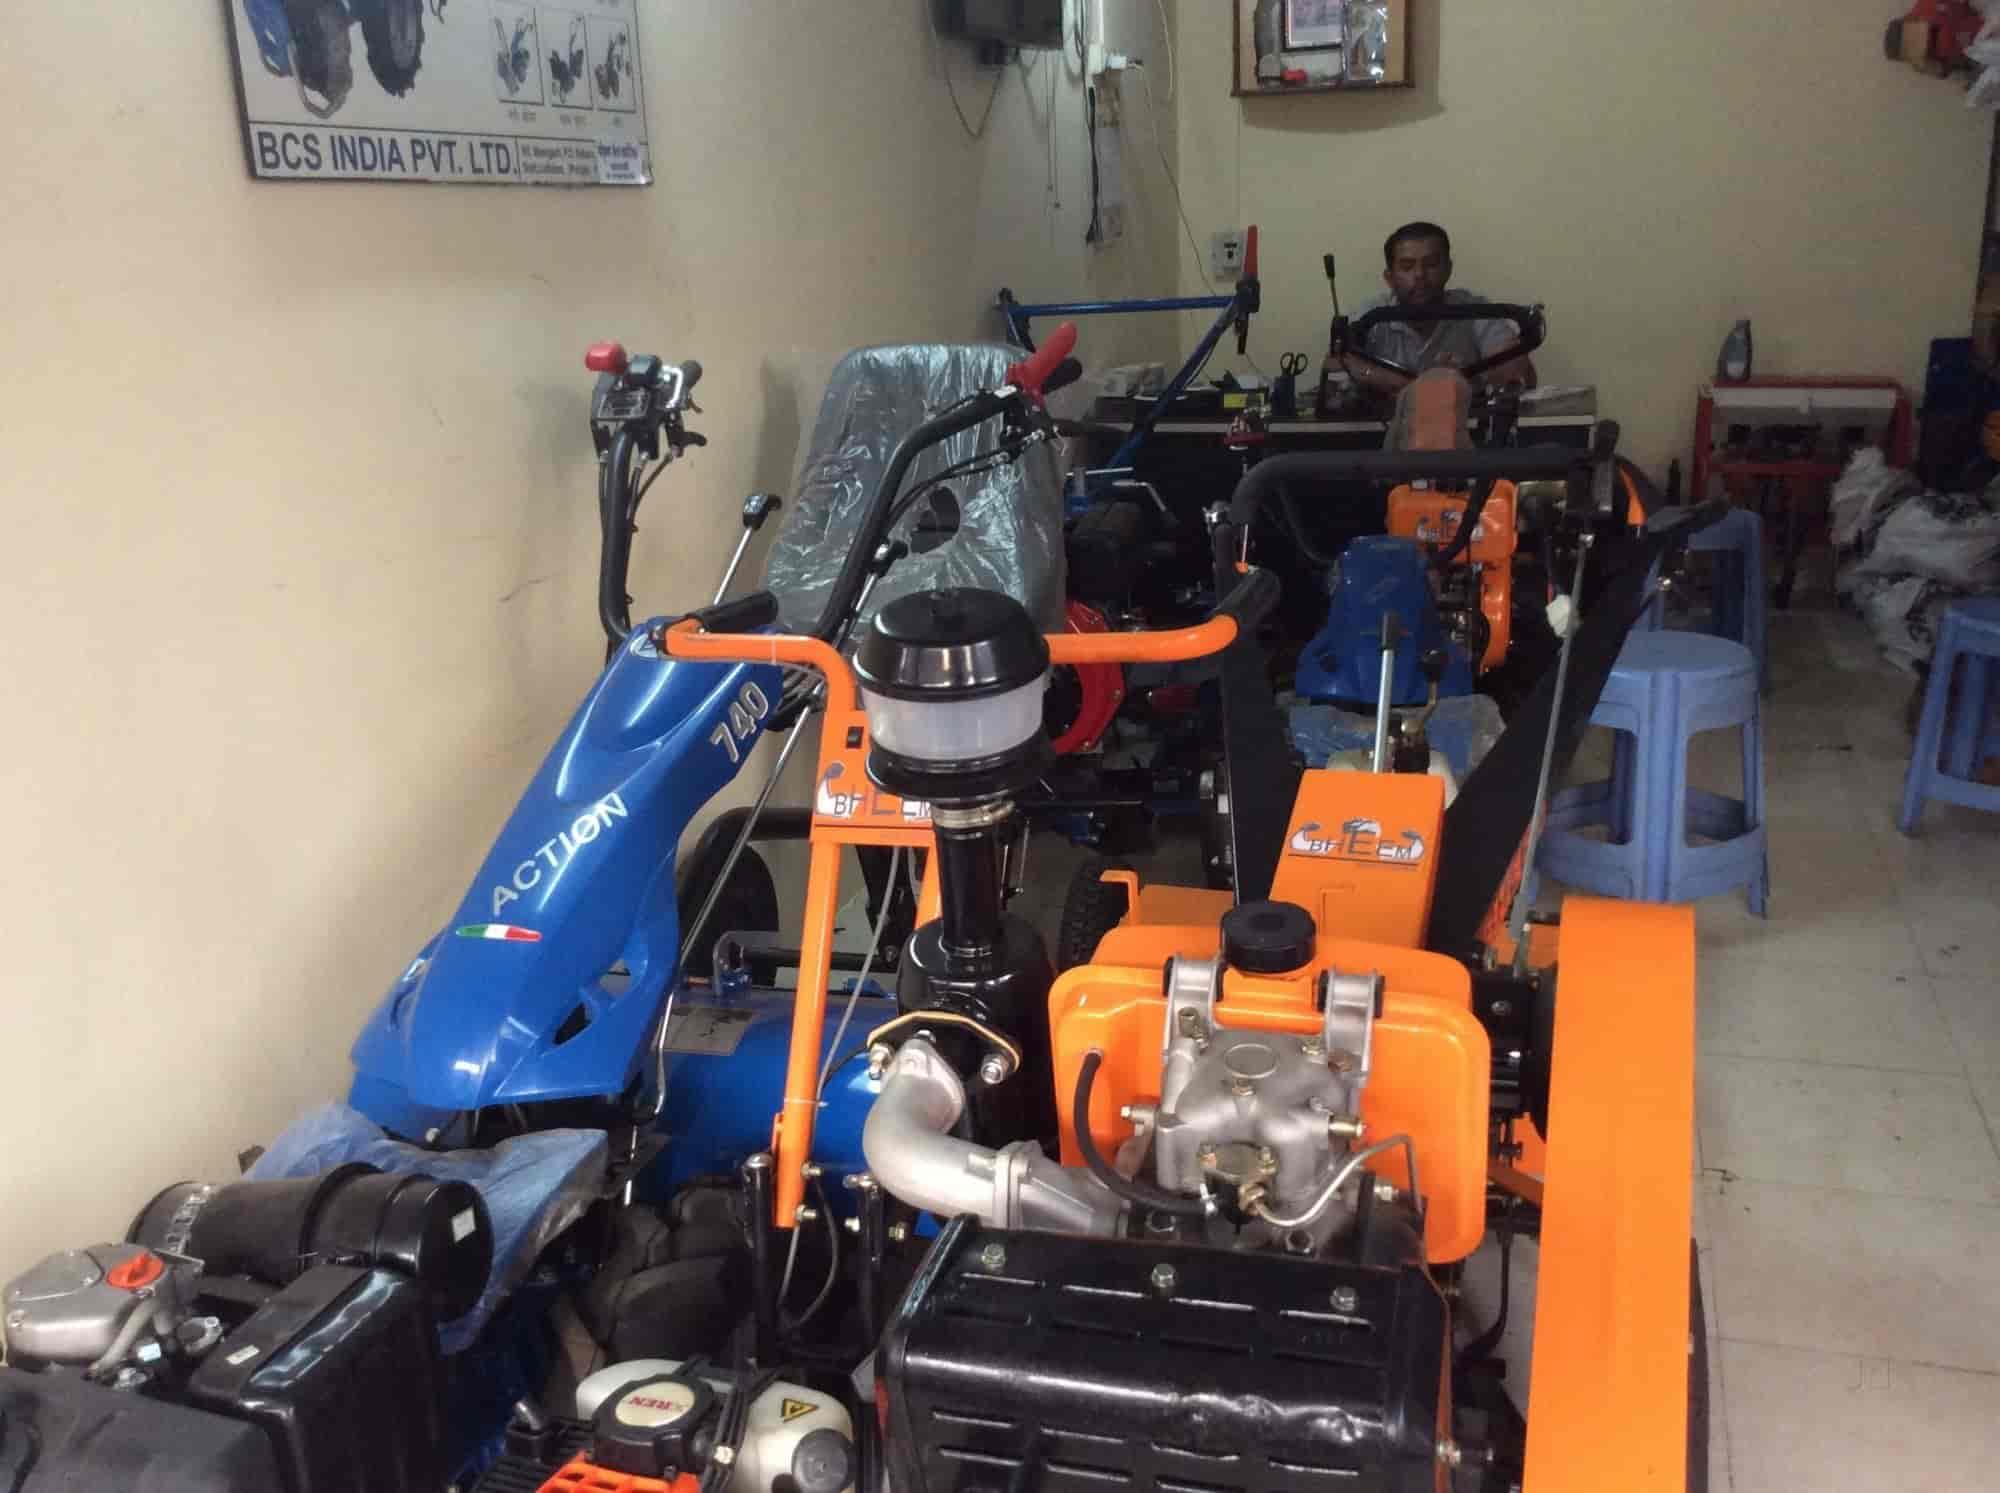 Shri Krushna Sales Corporation, Sangli Ho - Tractor Dealers